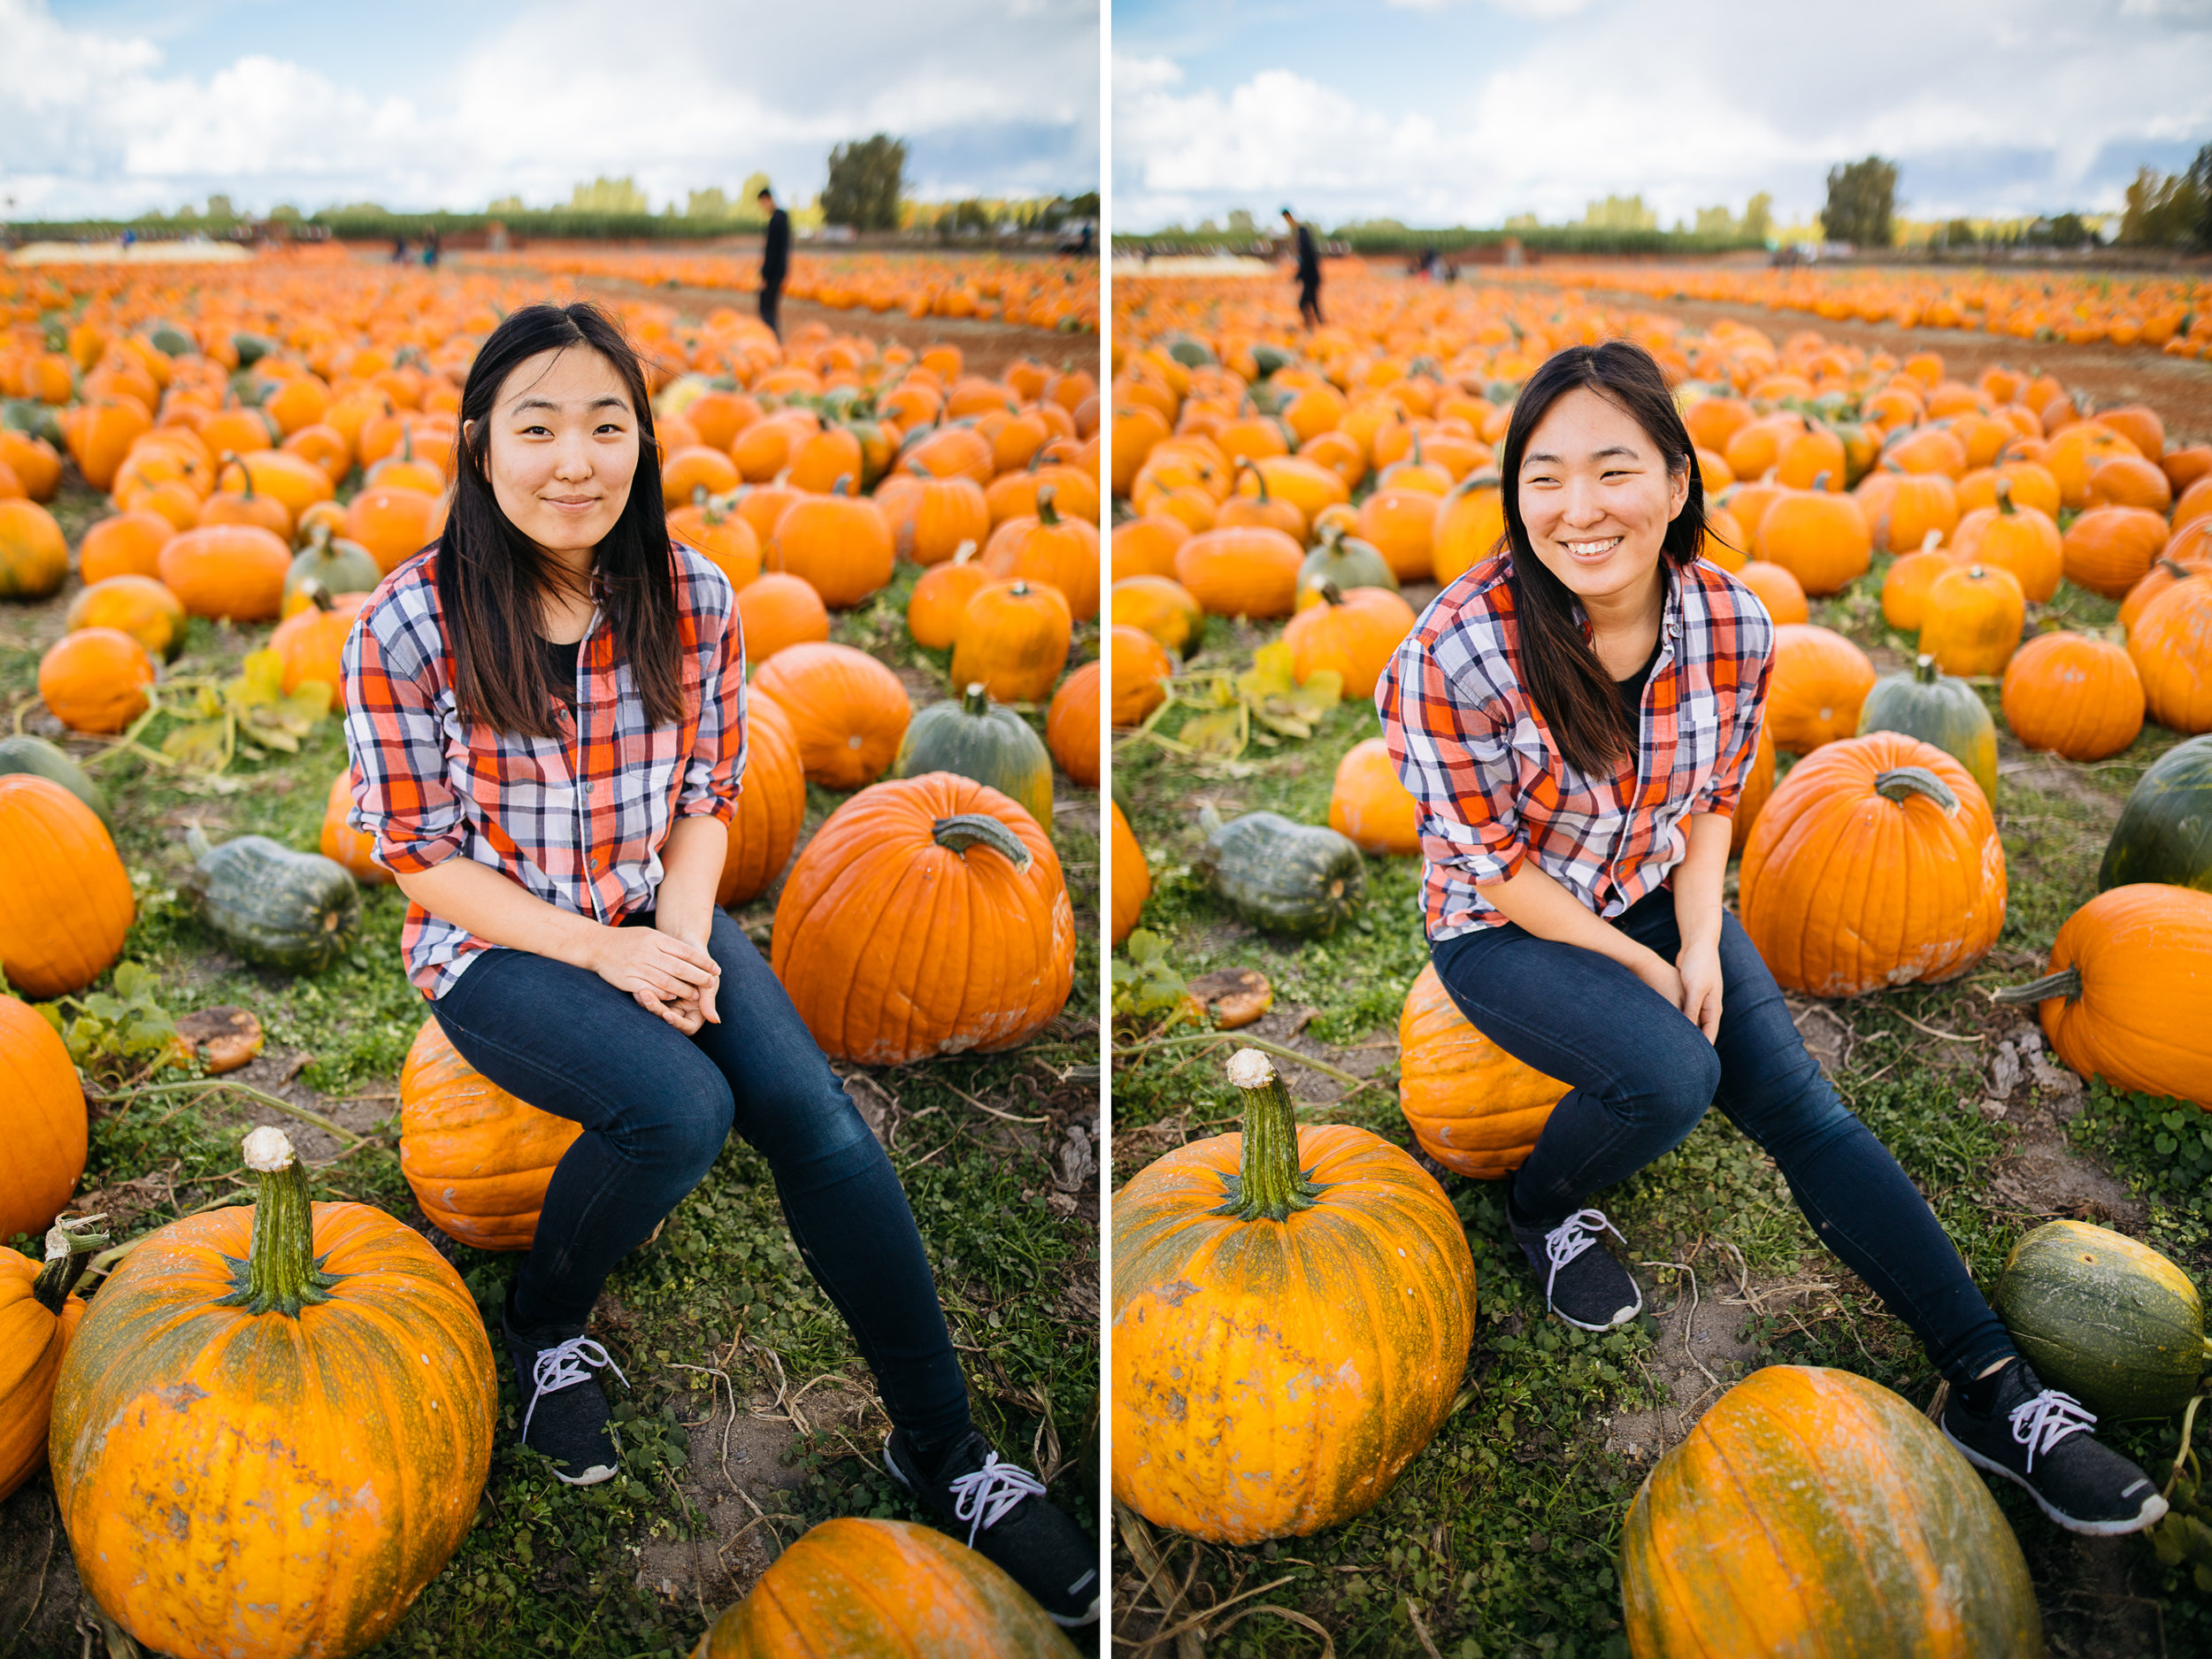 10-11-2017 Susan Kwon Blog Diptych 1.jpg